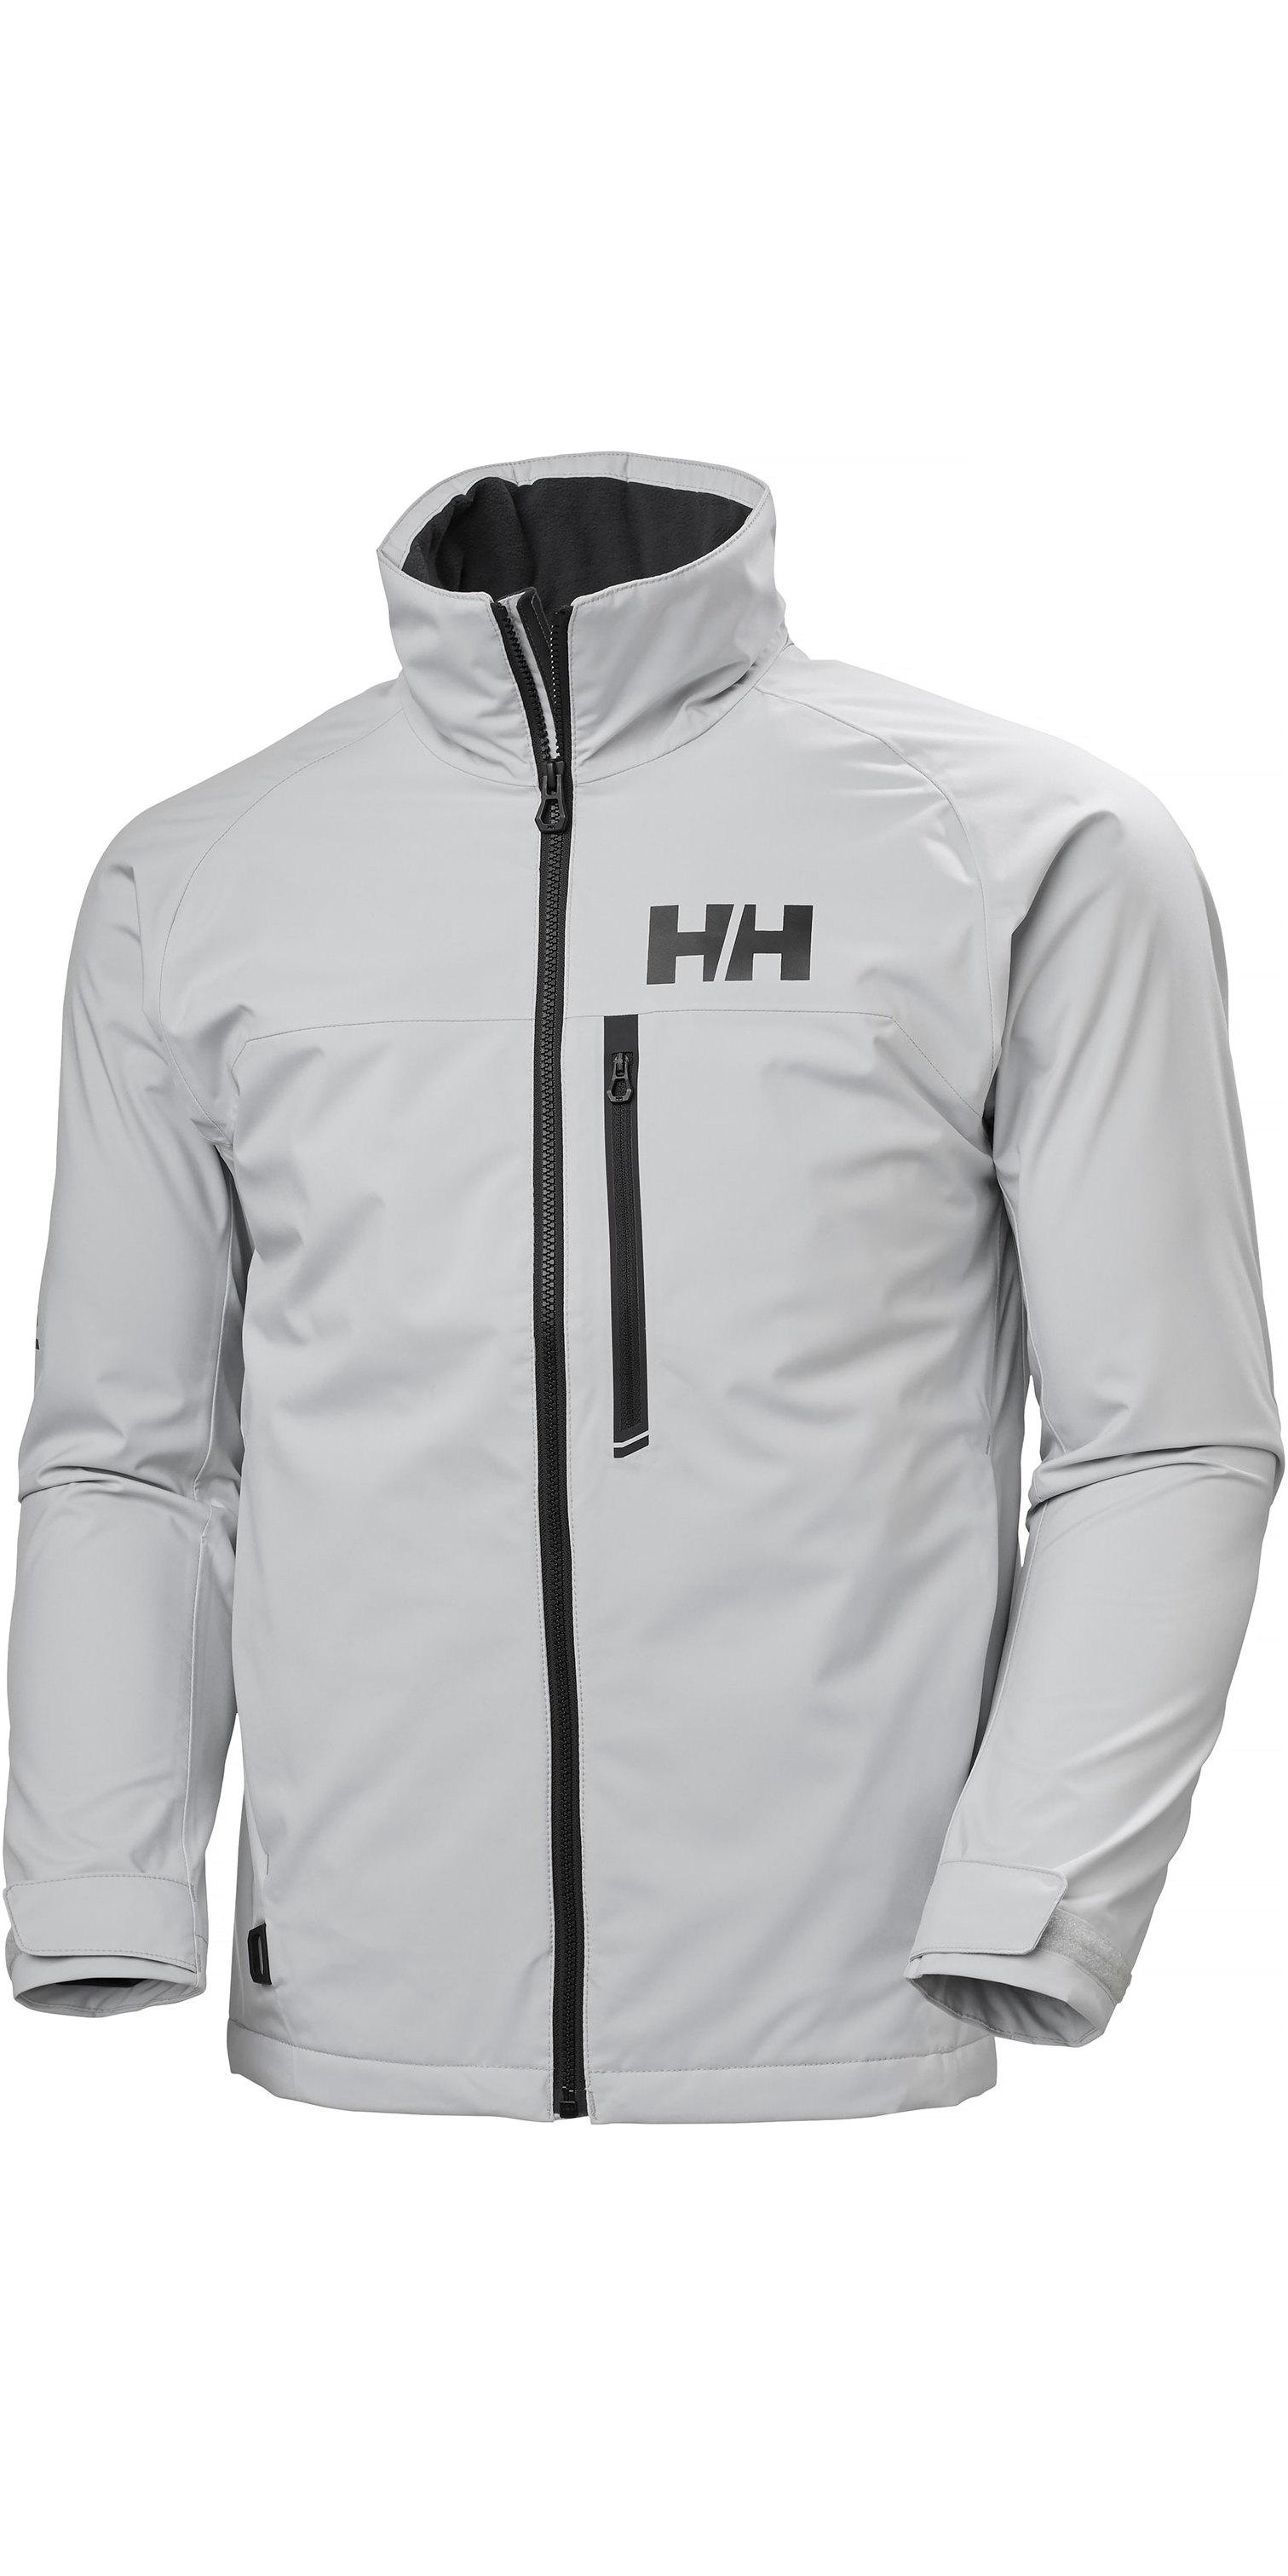 2020 Helly Hansen Herre Hp Racing Midlayer Jakke 34041 Grå Tåge